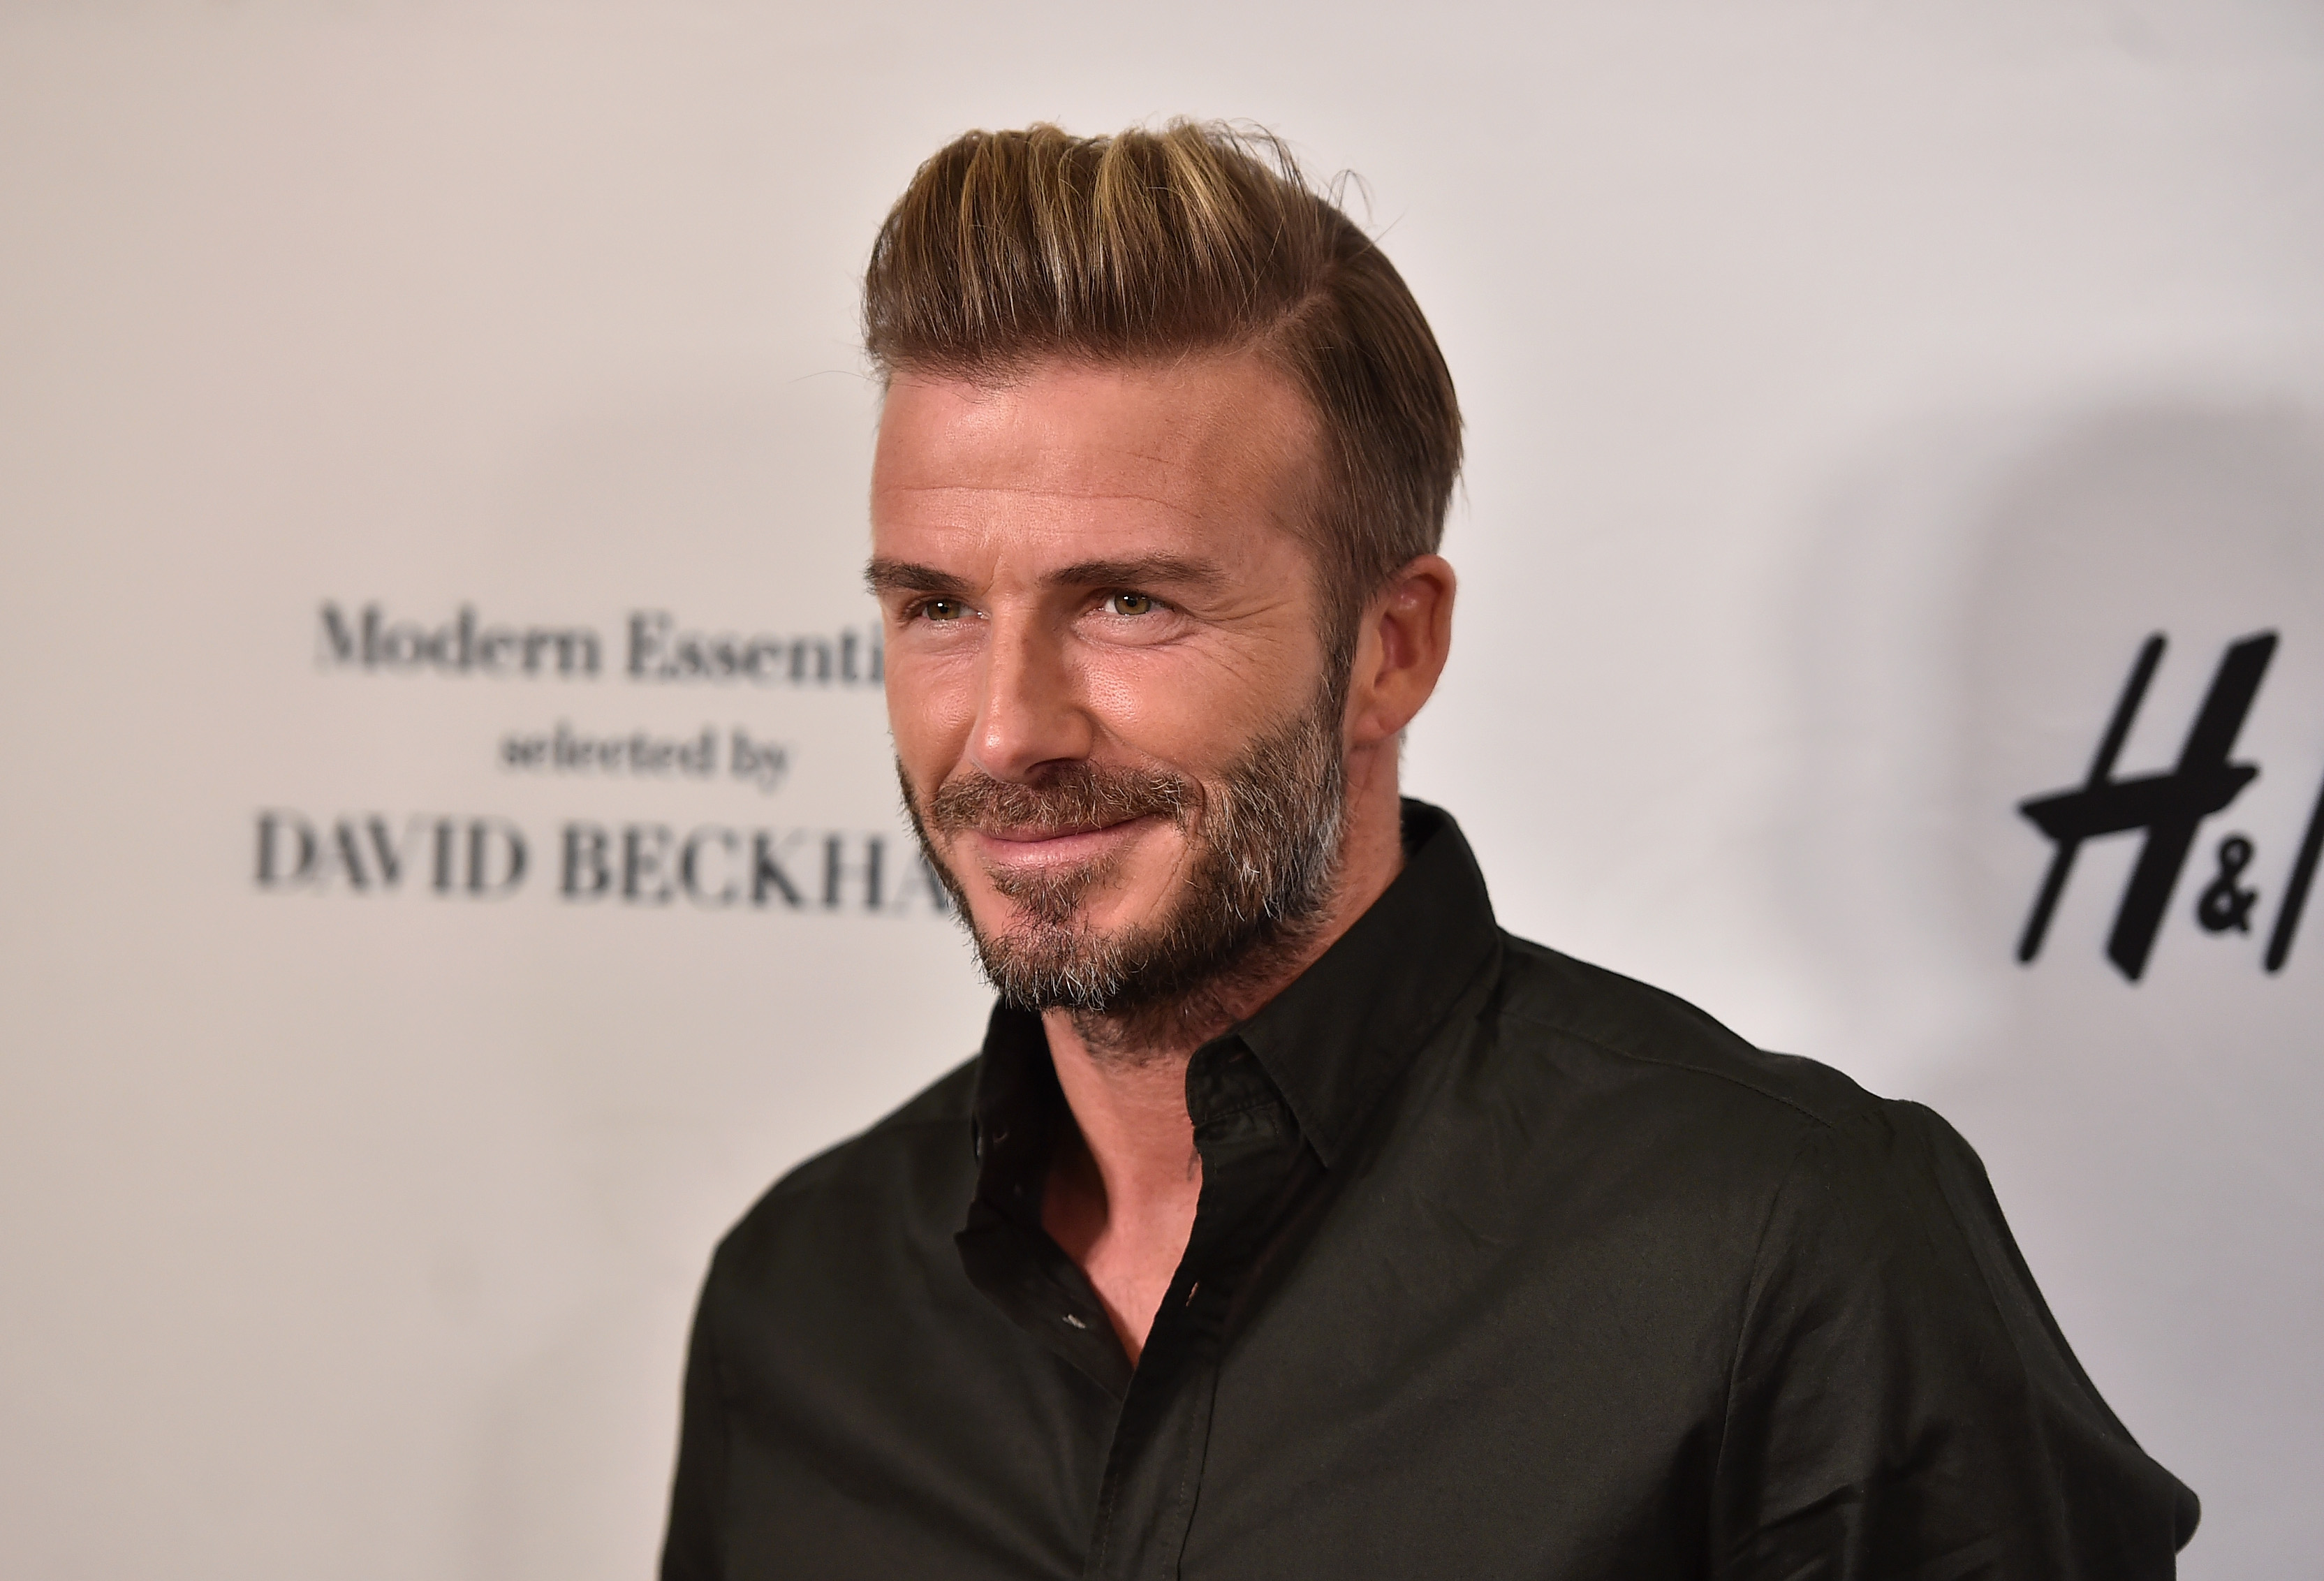 David Beckham Launches New H&M Modern Essentials Campaign